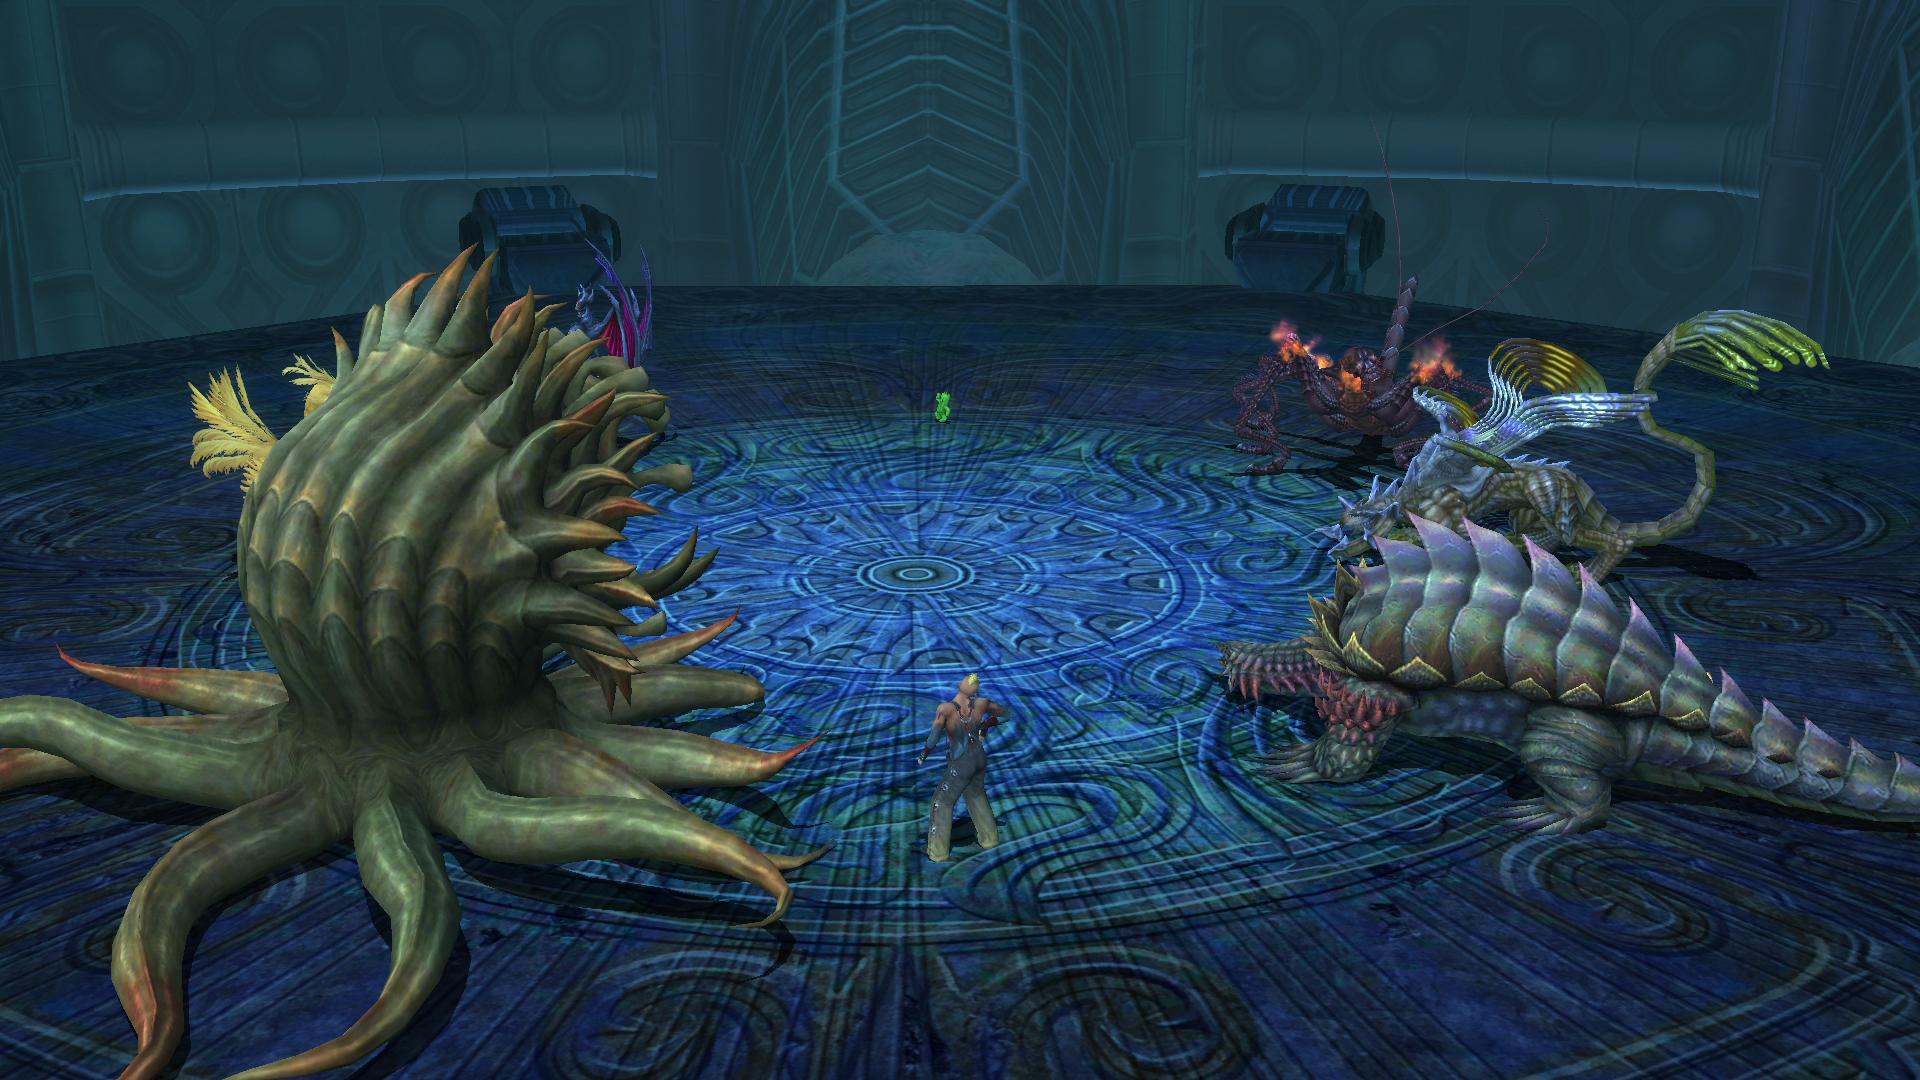 creature creator final fantasy wiki fandom powered by wikia